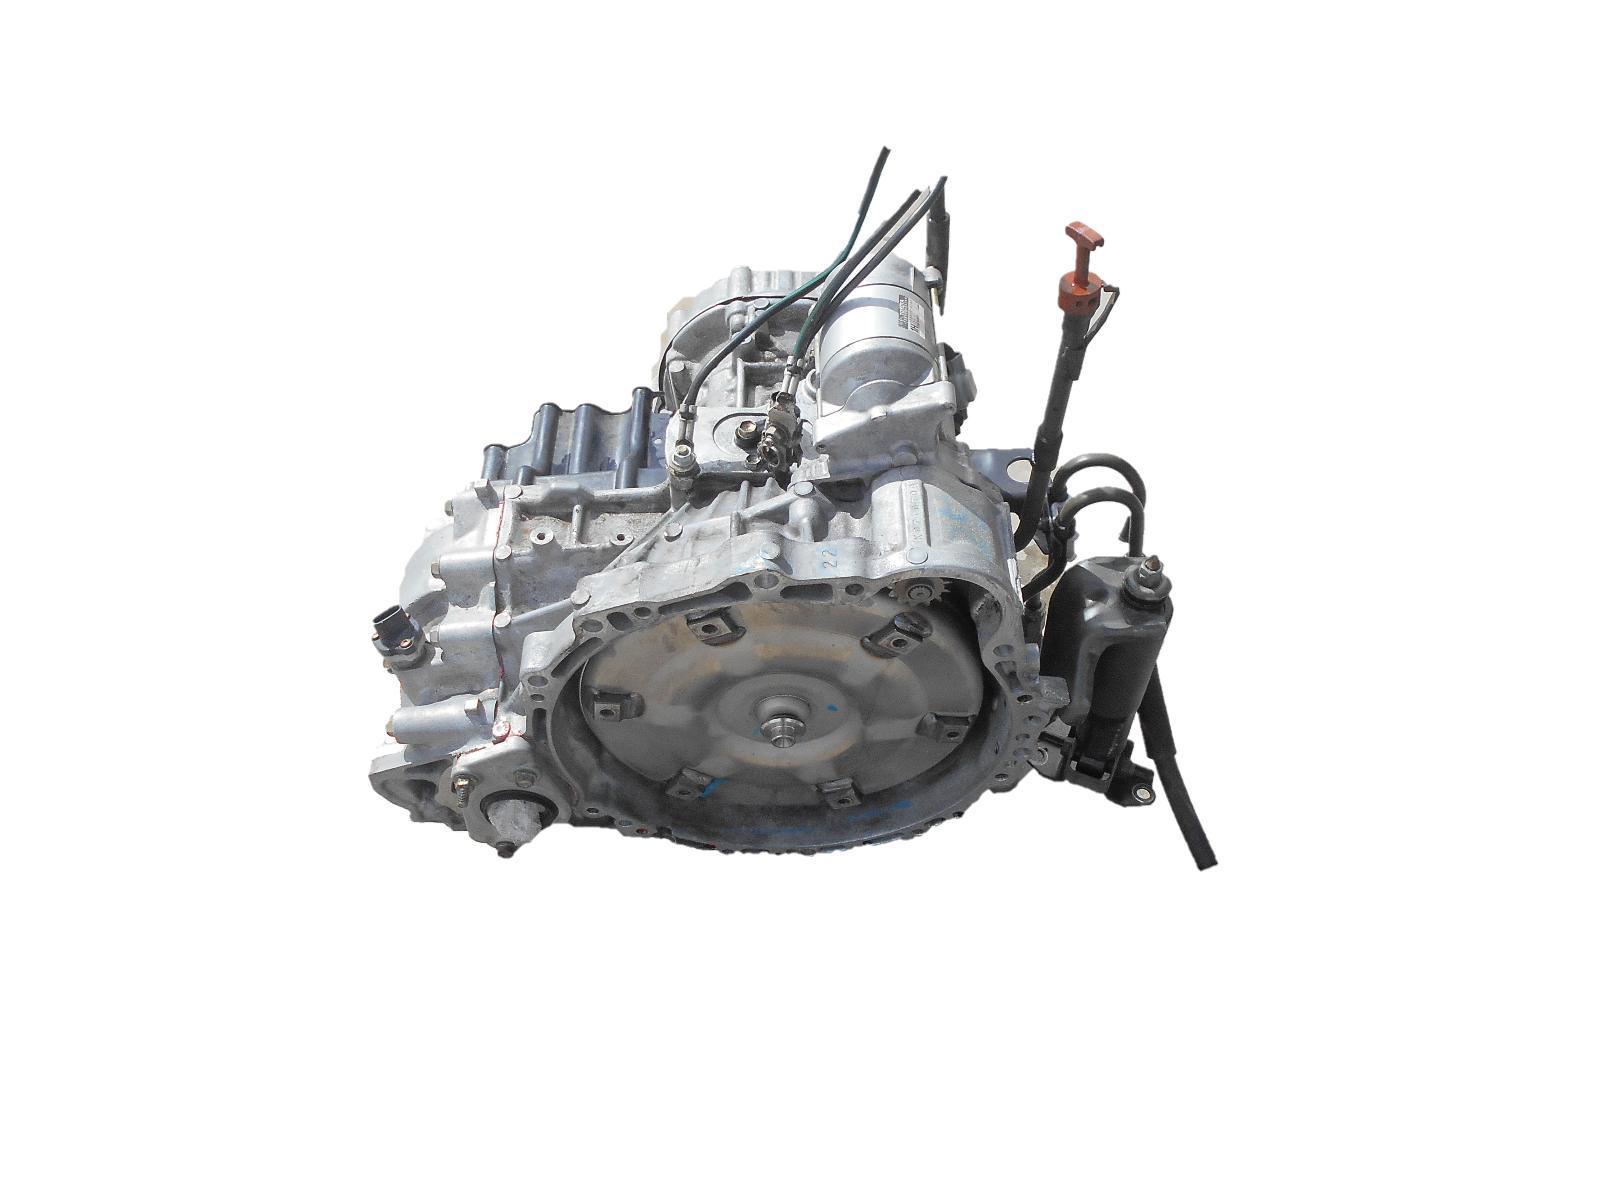 TOYOTA AVALON, Trans/Gearbox, AUTO, 3.0, 1MZ-FE, MCX10R, 07/00-06/05